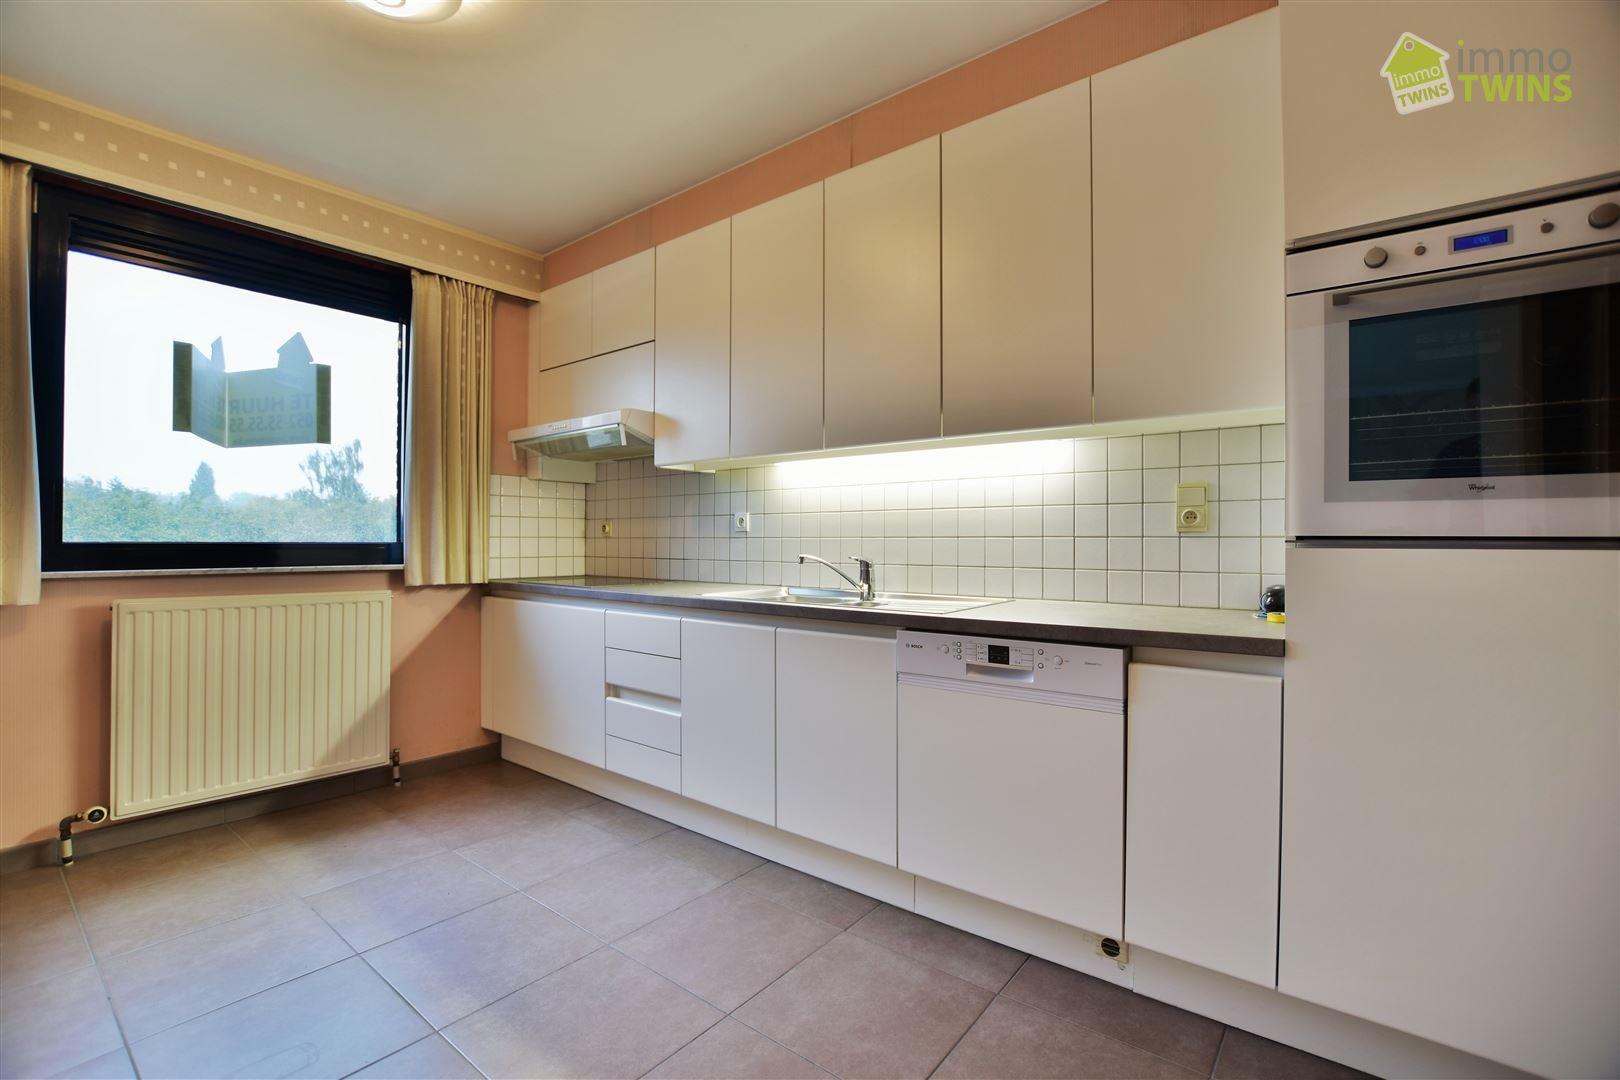 Foto 7 : Appartement te 9200 DENDERMONDE (België) - Prijs € 725